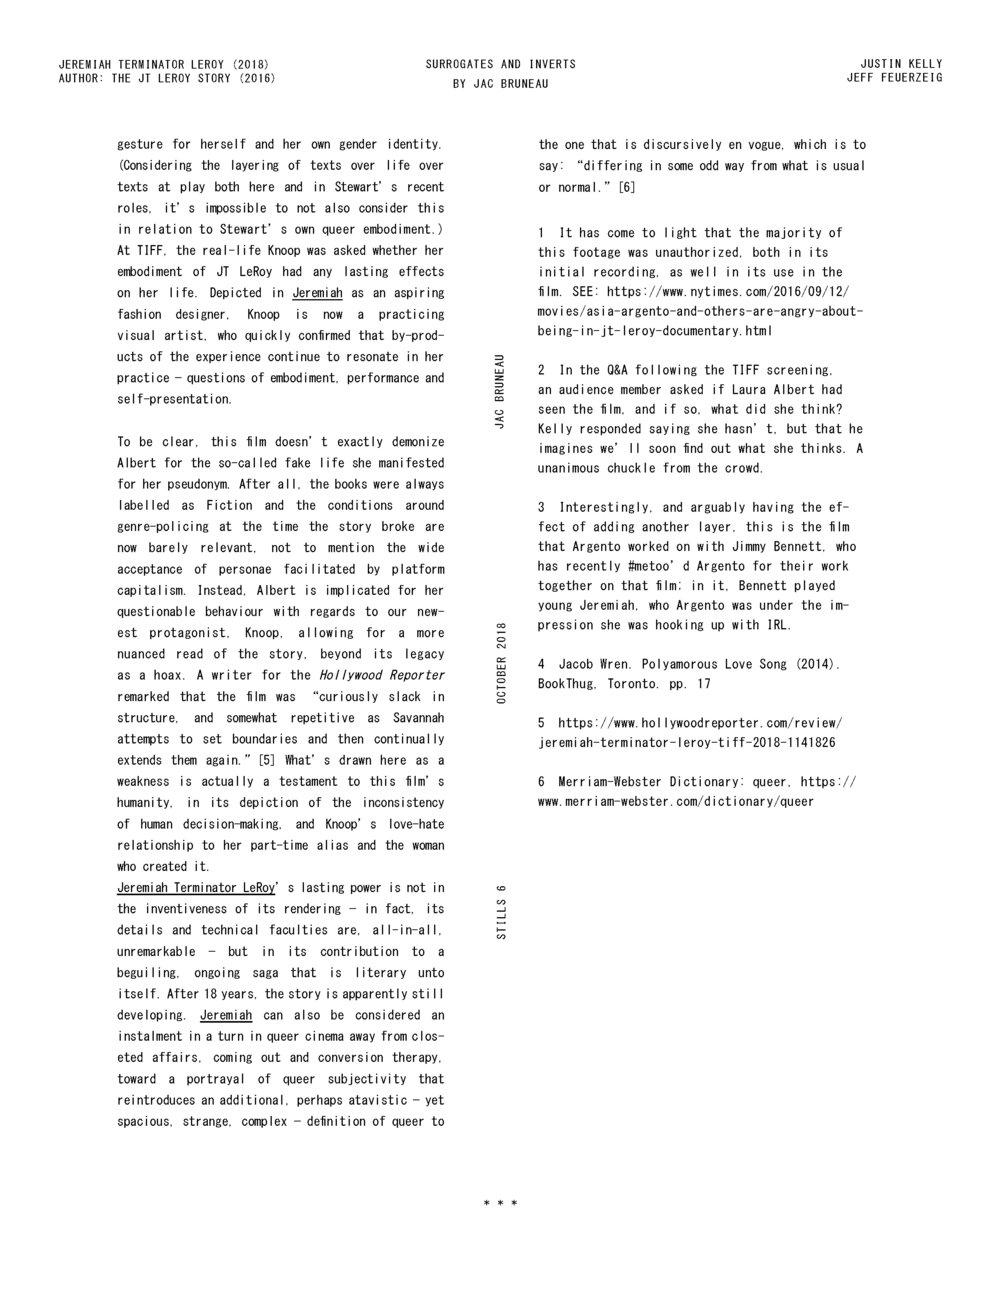 jpeg full final_Page_3.jpg